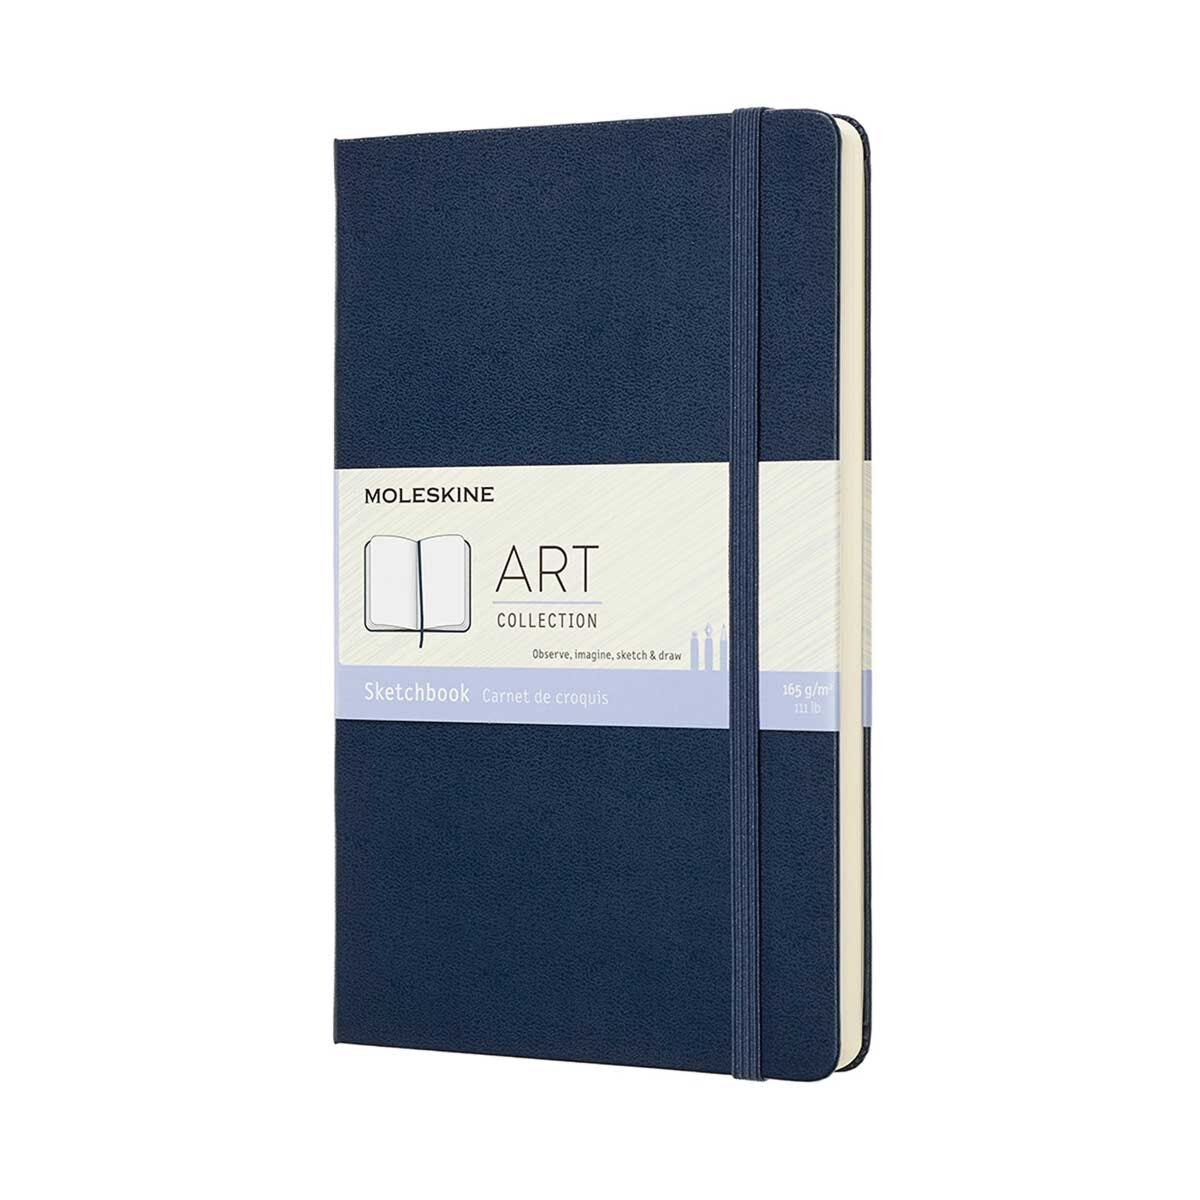 Moleskine Classic Art Plus Sketchbook Large